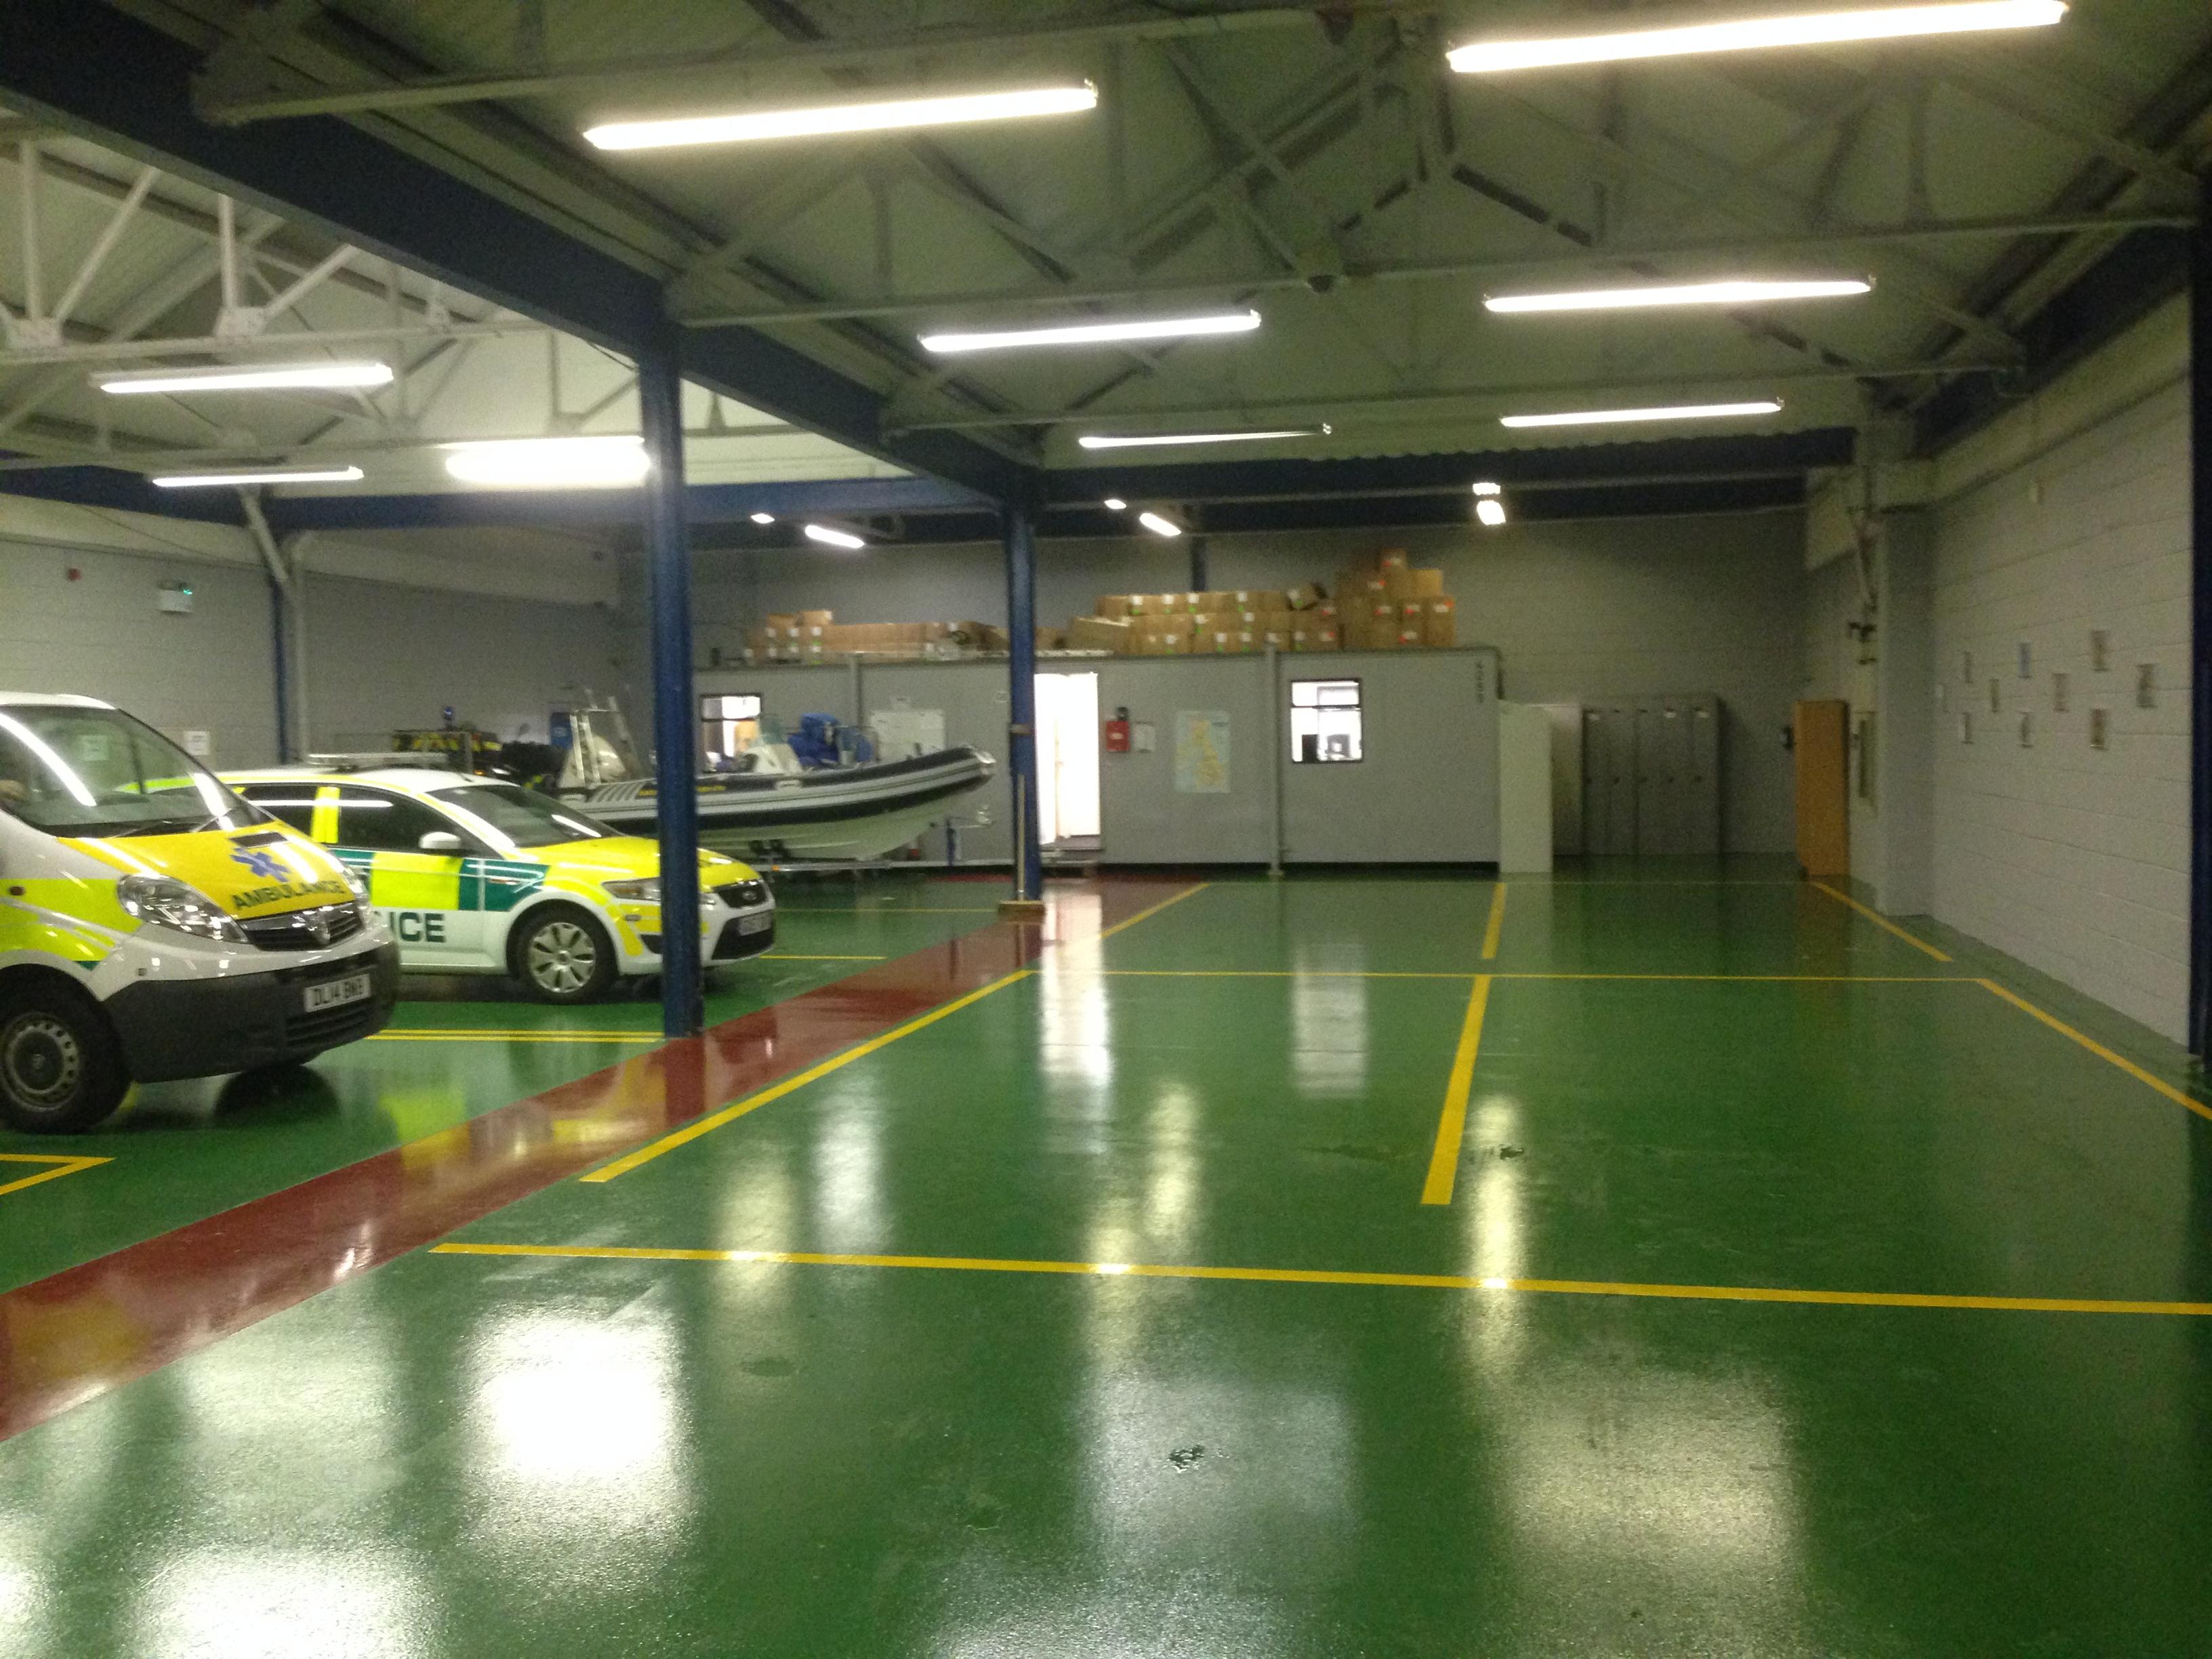 Ambulance Station Workshop Resin Flooring Acl Industrial